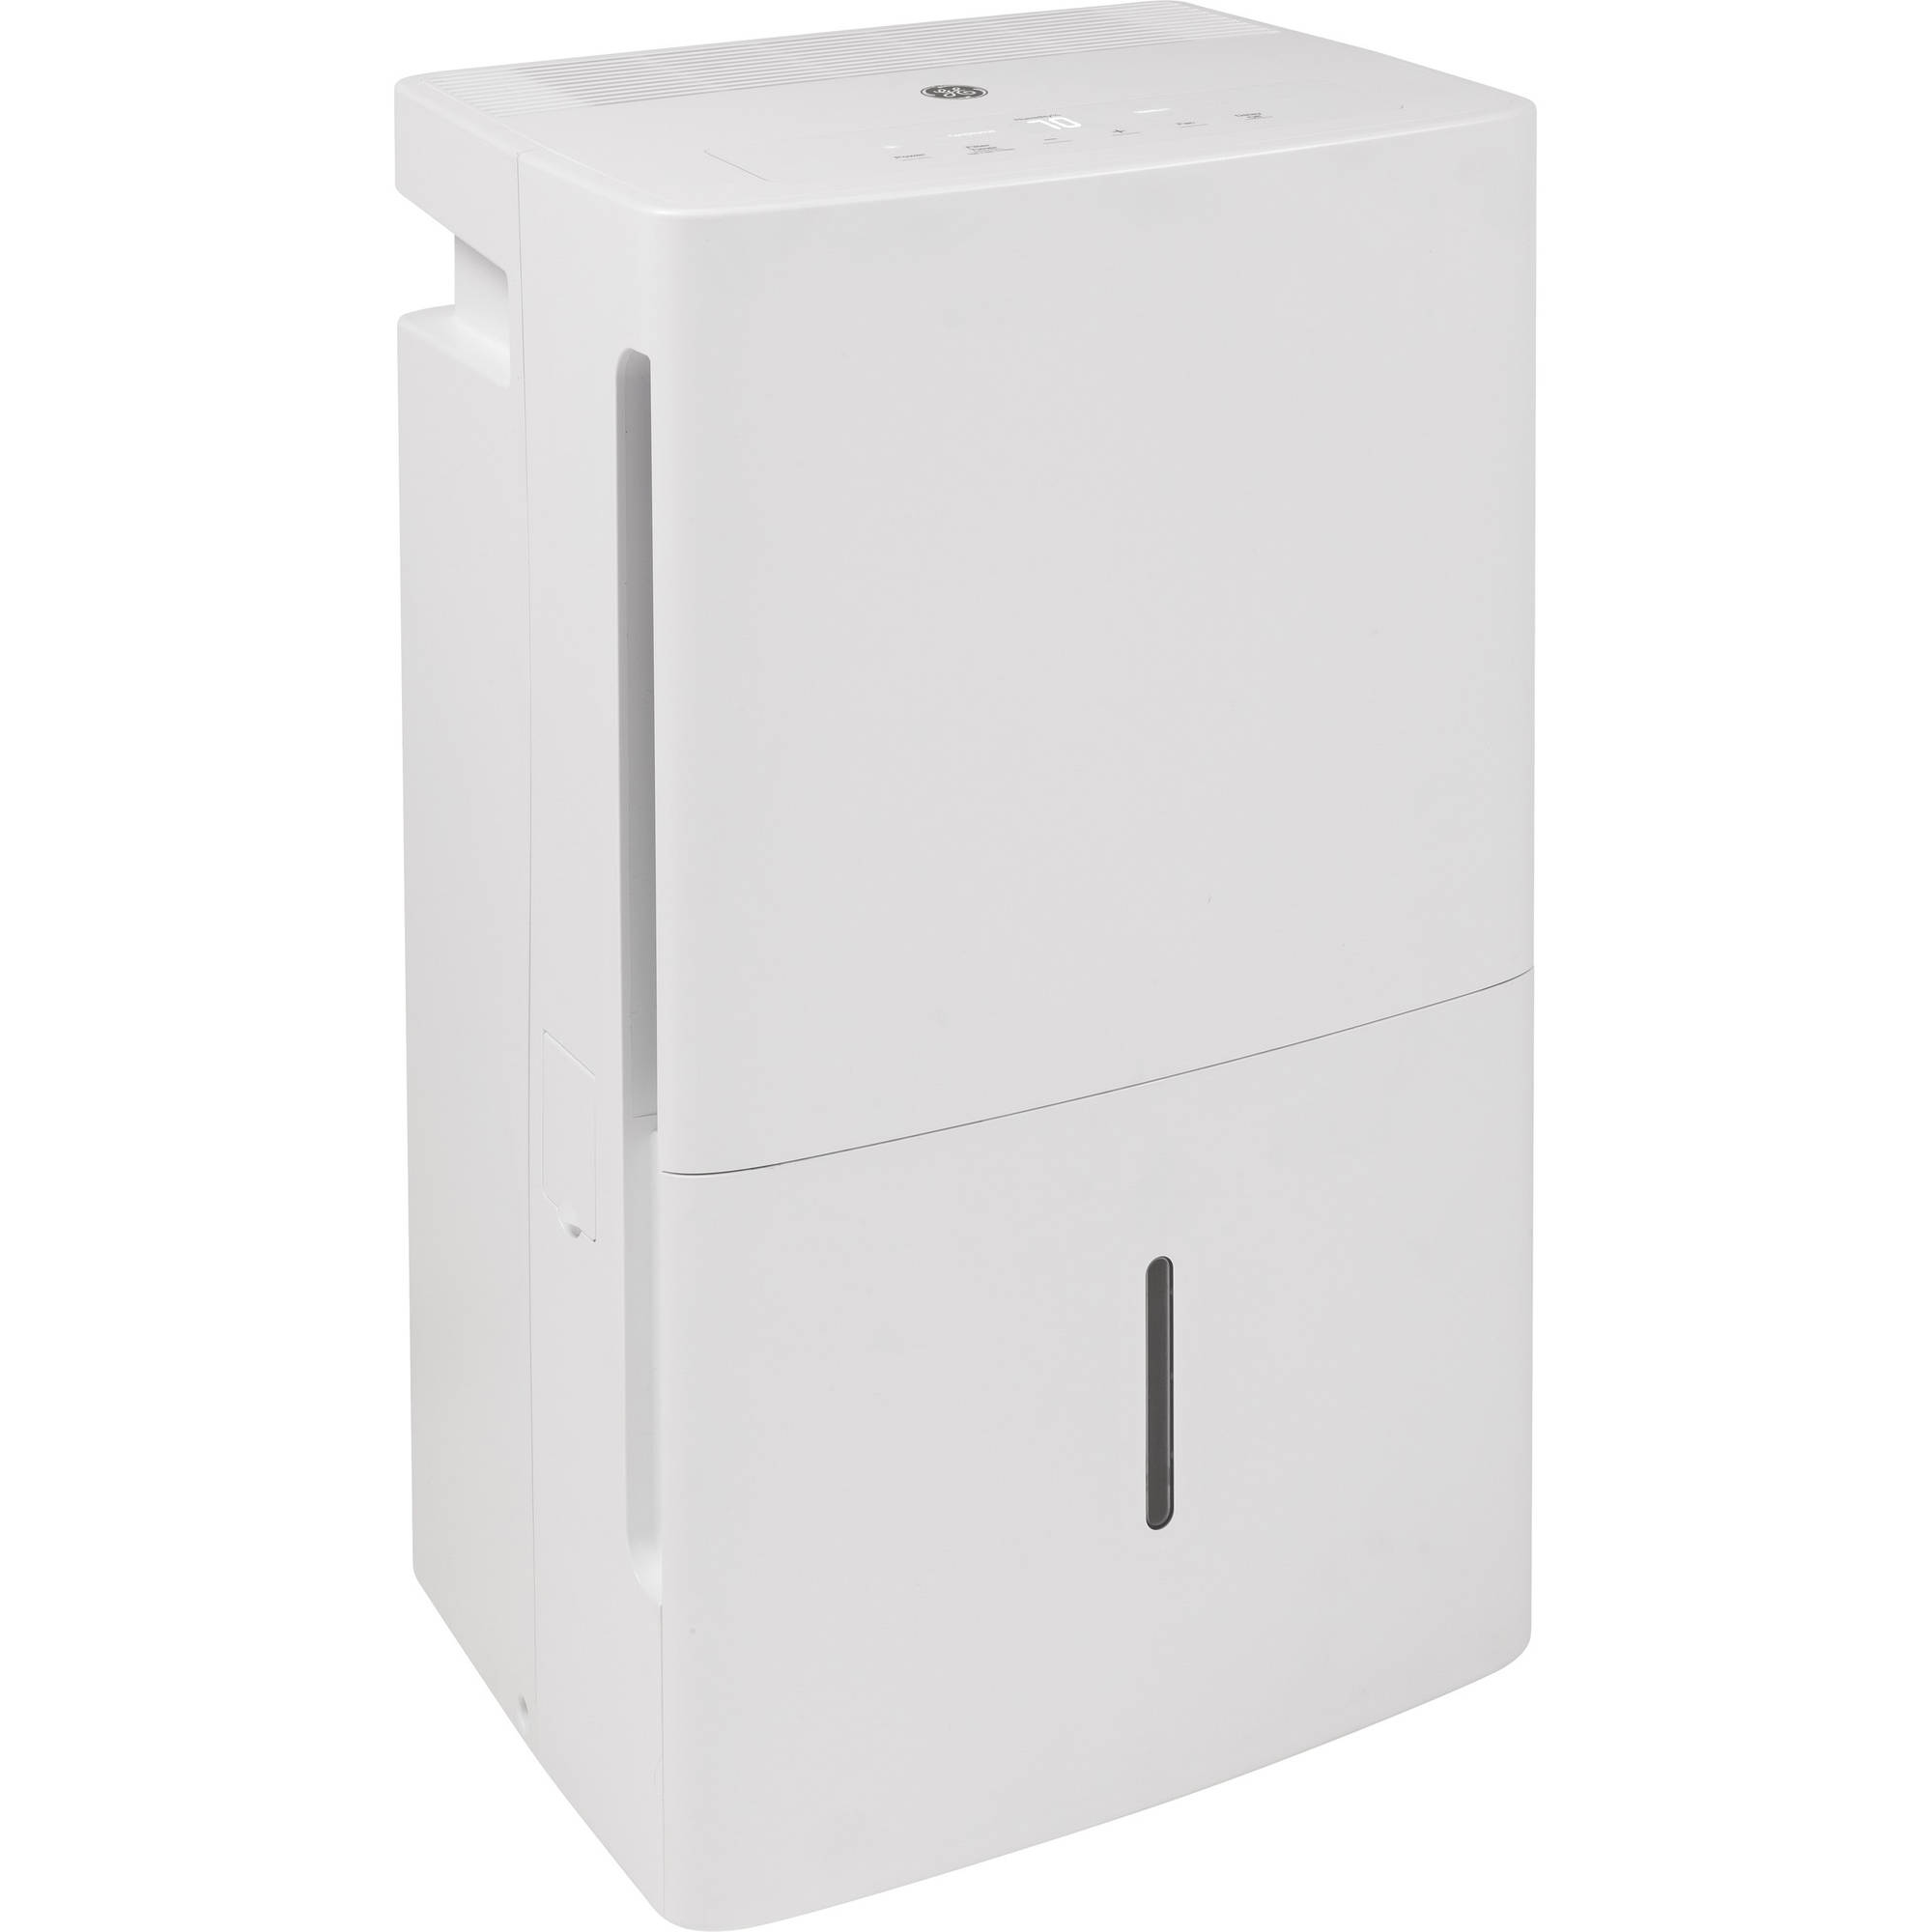 Walmart Dehumidifier Filters ge appliances 50-pint energy star dehumidifier, white - walmart